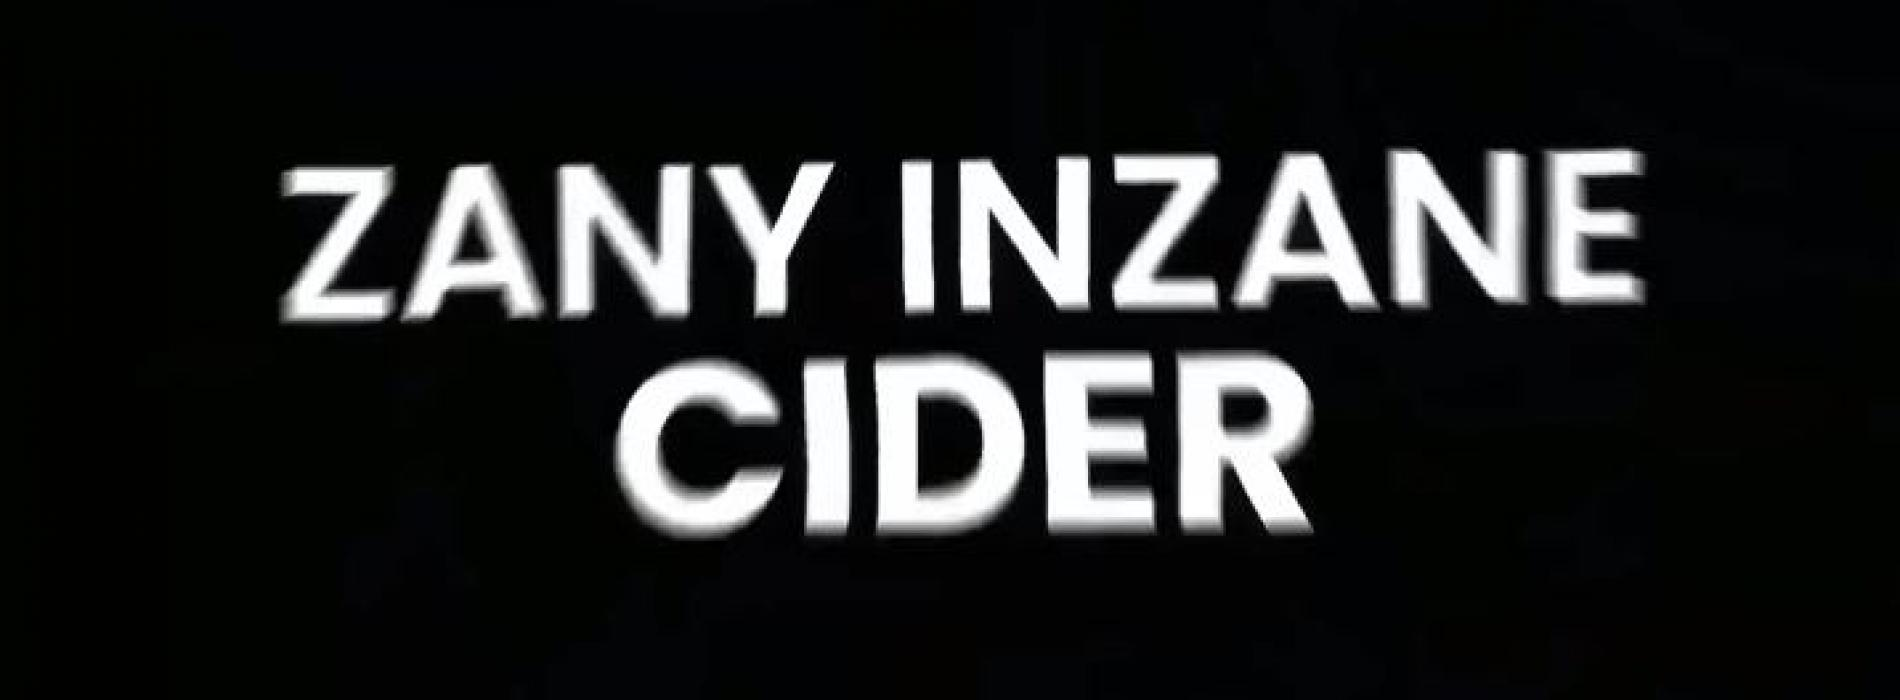 New Music : Zany Inzane – Cider (Official Lyrics Video)